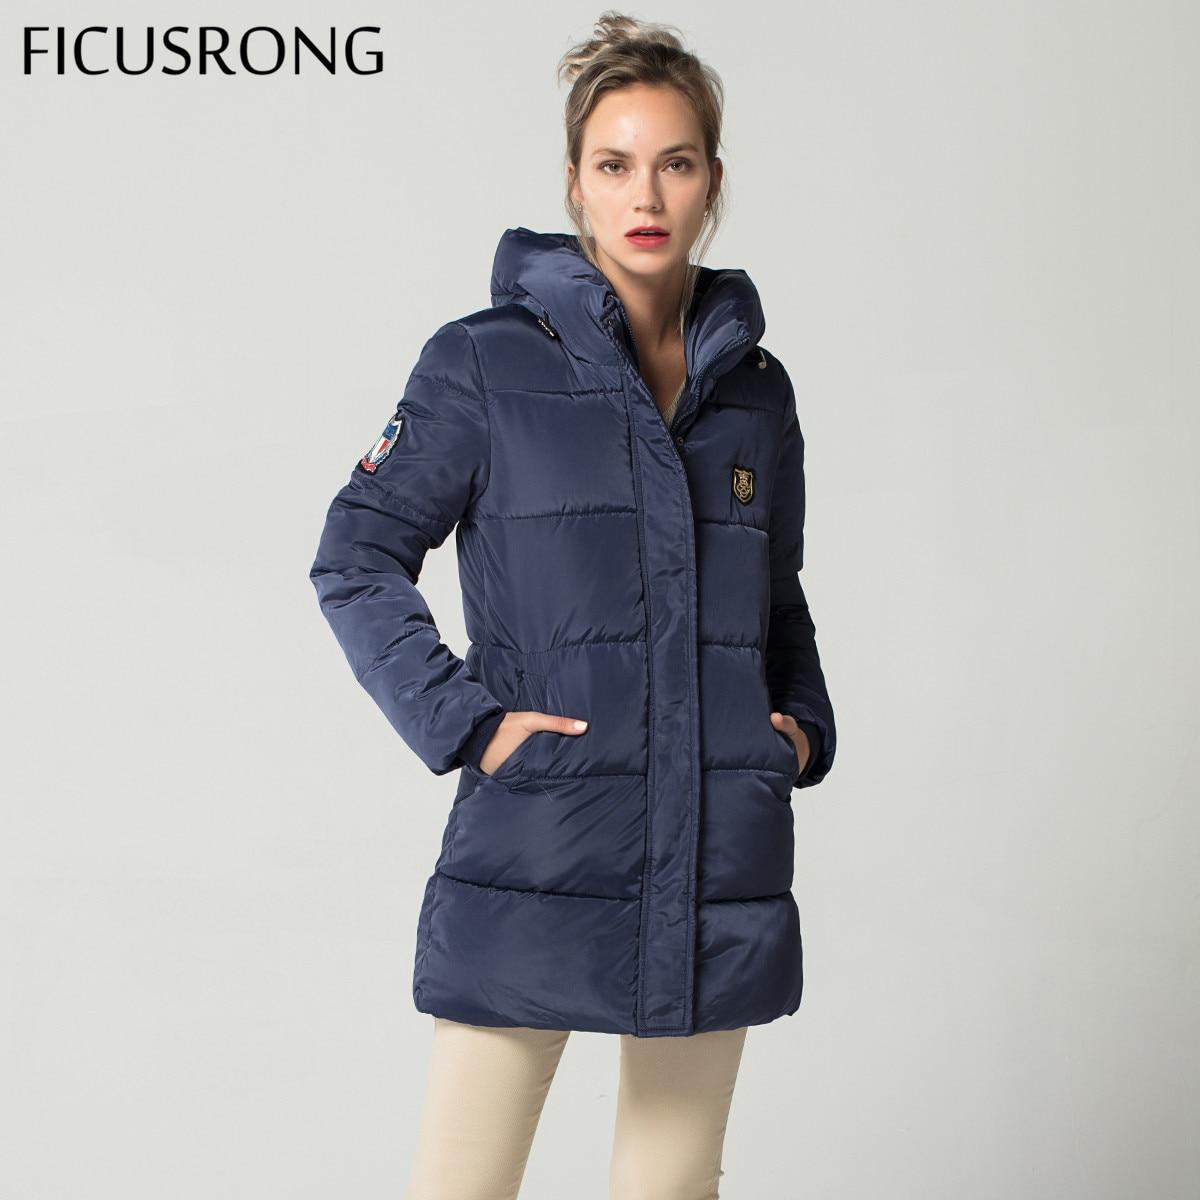 Long Down   Parkas   Female Women Winter Coat Thick Warm Cotton Hooded Jacket Womens Outerwear   Parkas   for Women FICUSRONG